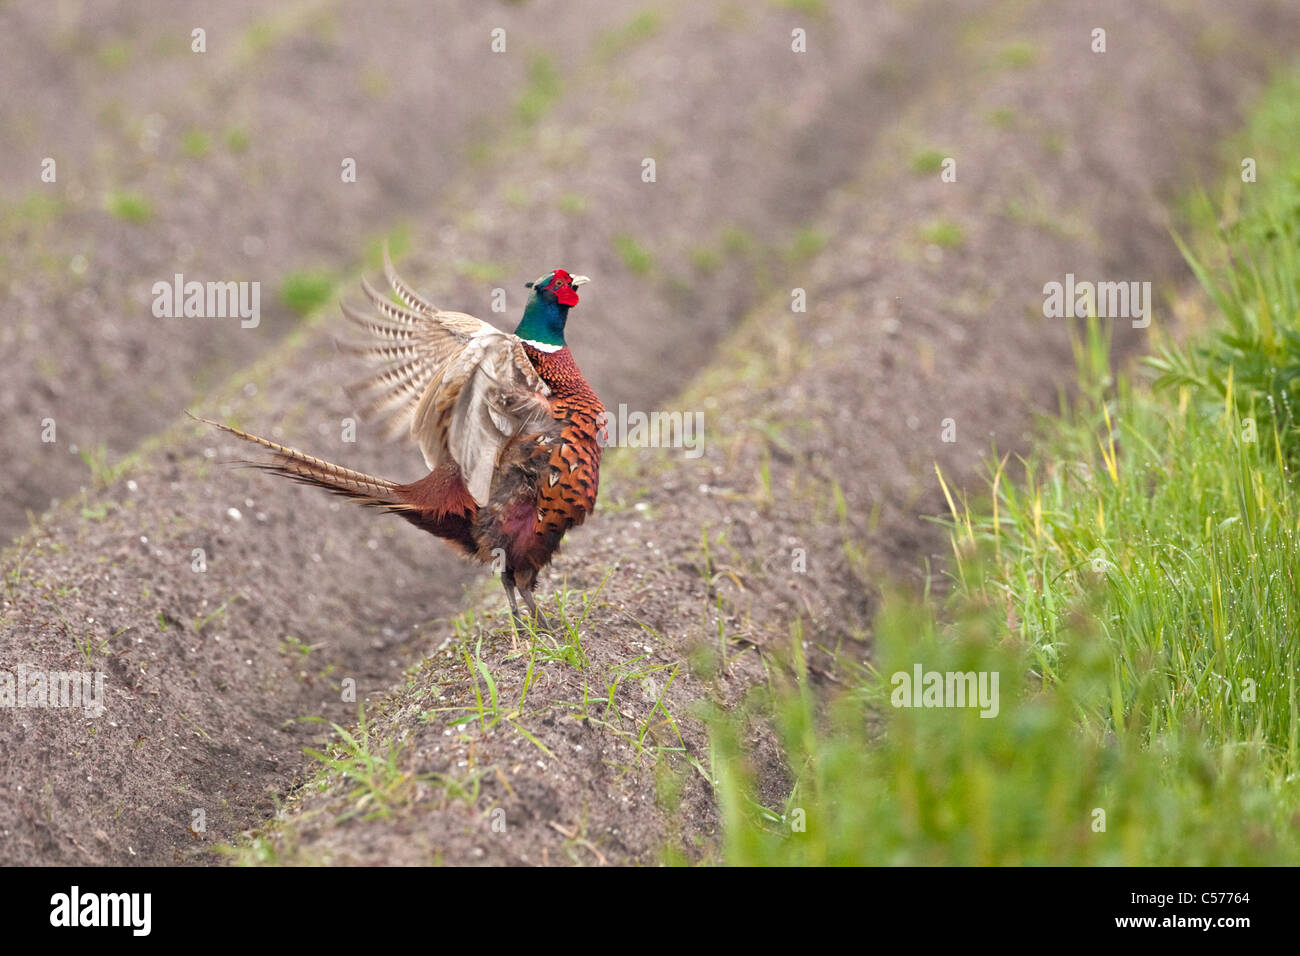 The Netherlands, Blankenham, Male pheasant. Phasianus colchicus. - Stock Image